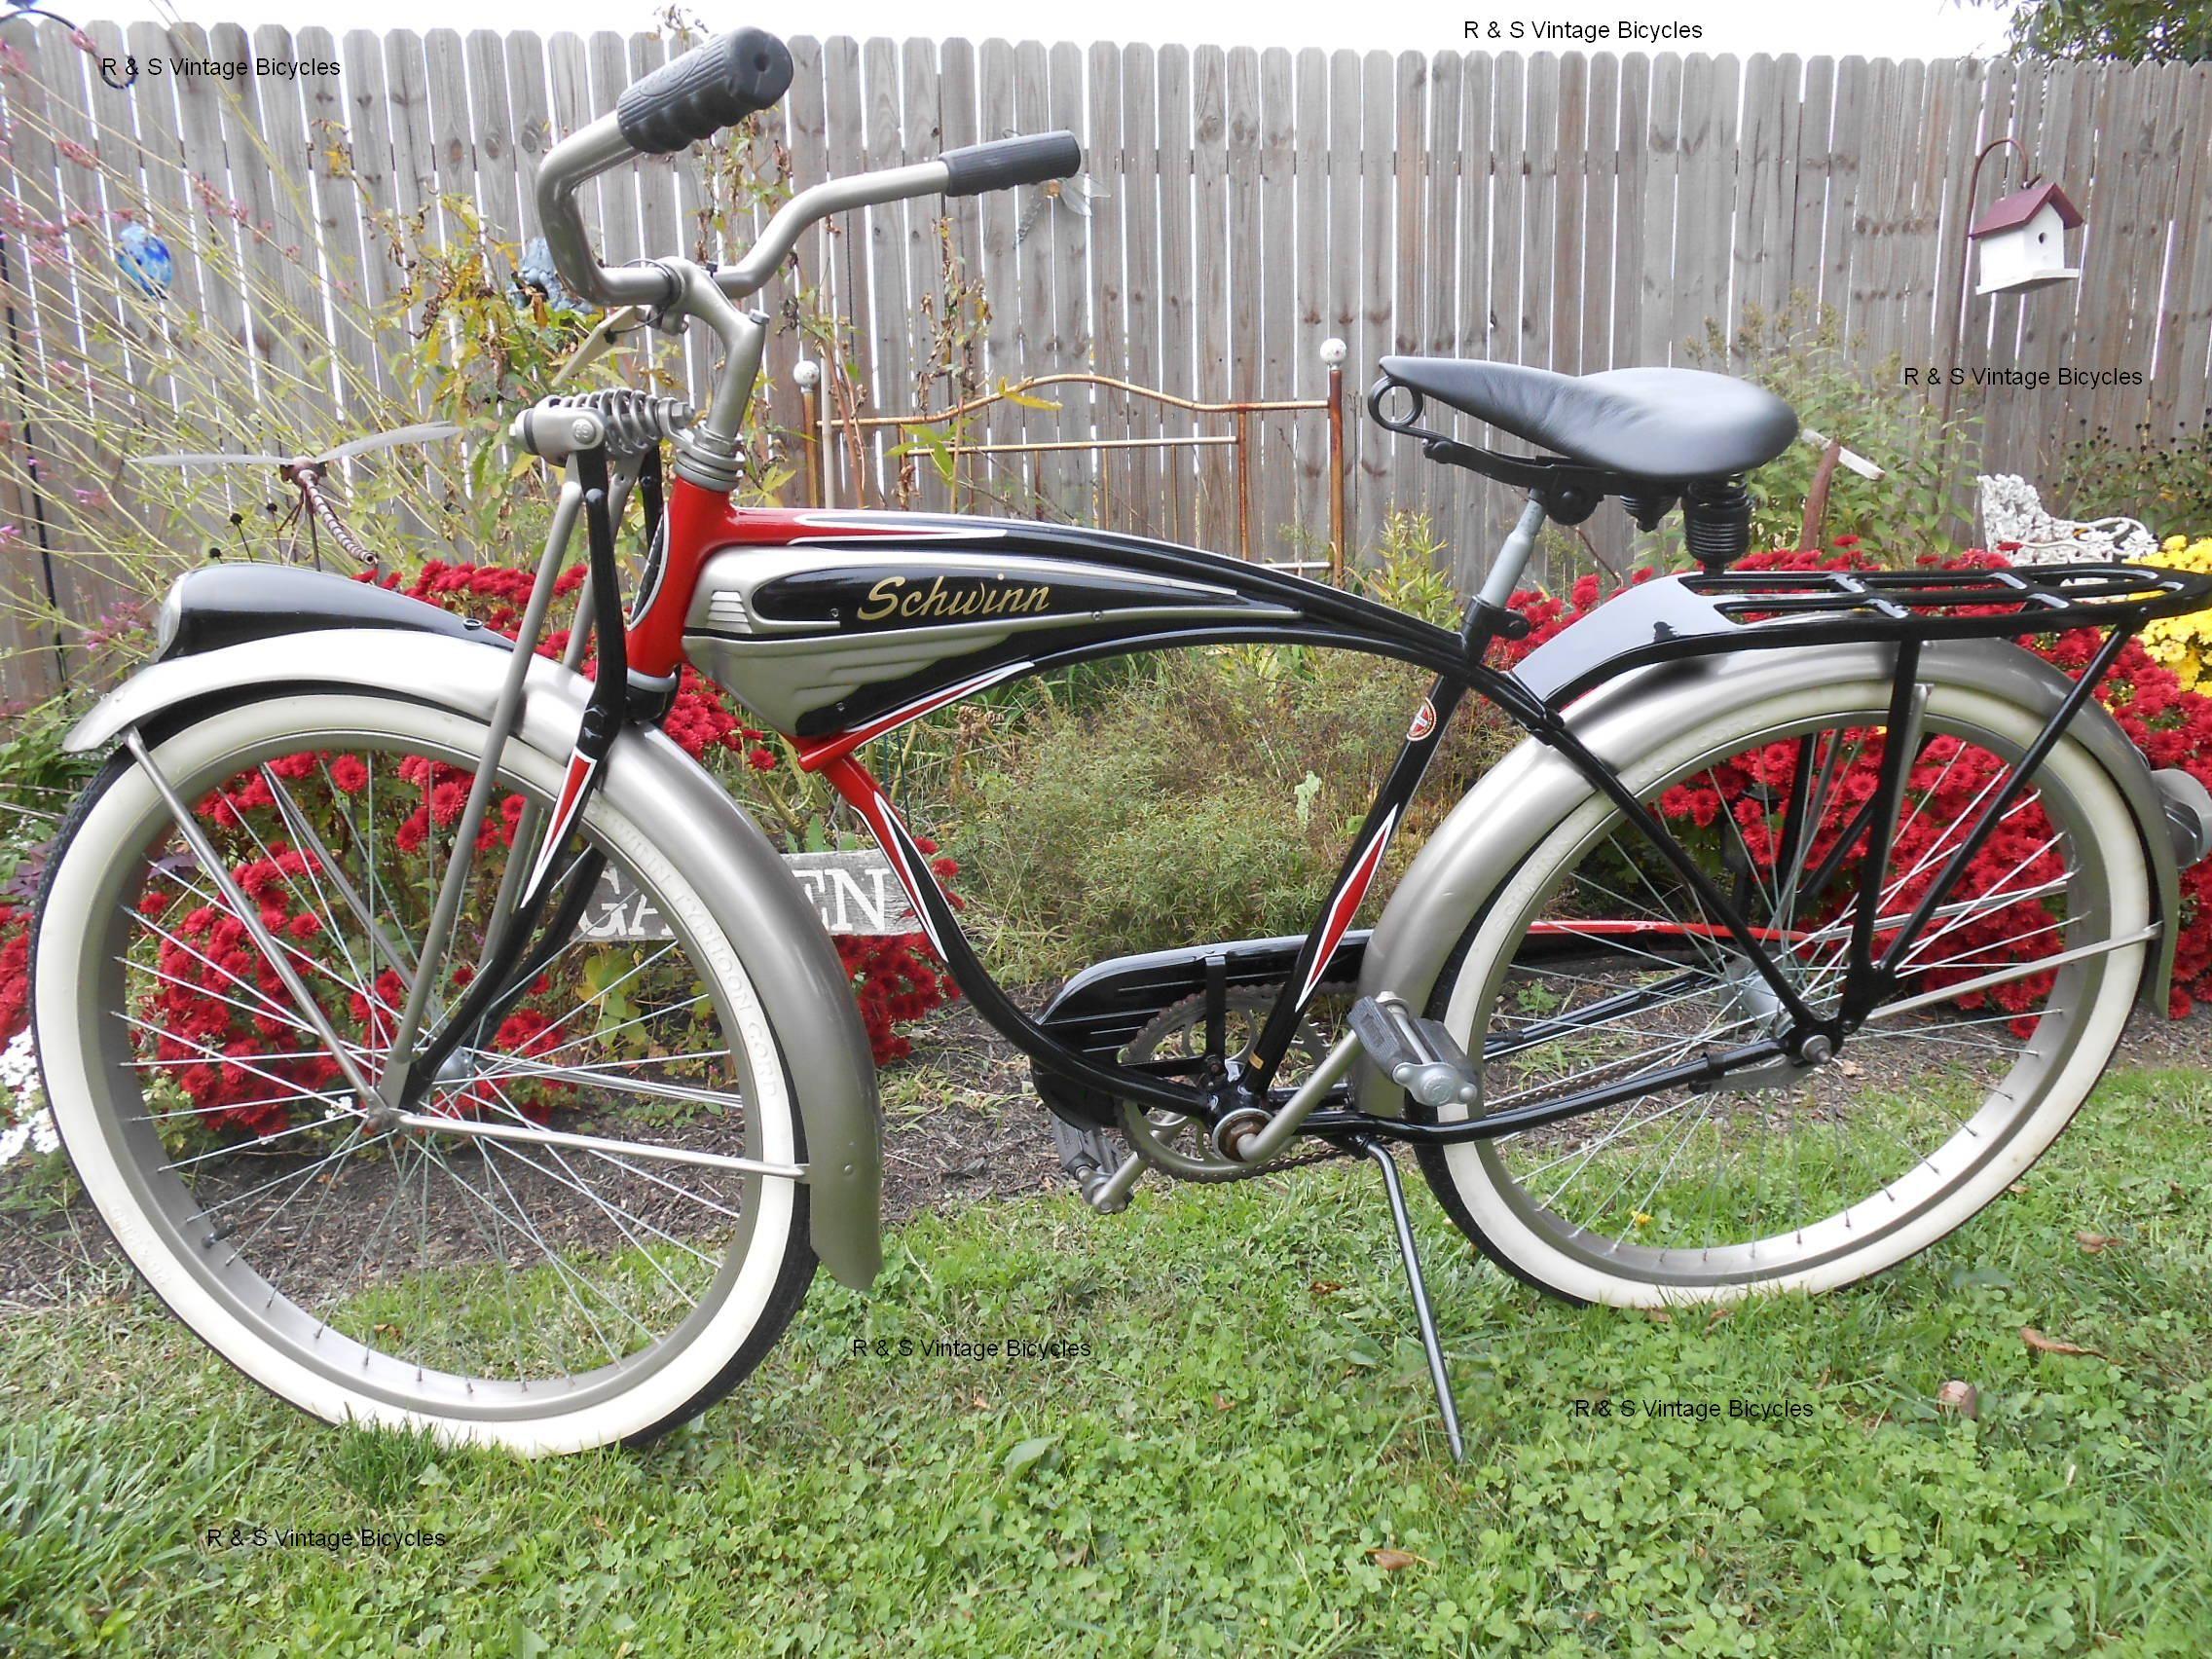 a40566f1ed7 1953 Schwinn Phantom. 1953 Schwinn Phantom Cruiser Bicycle, Old Bicycle, Old  Bikes ...